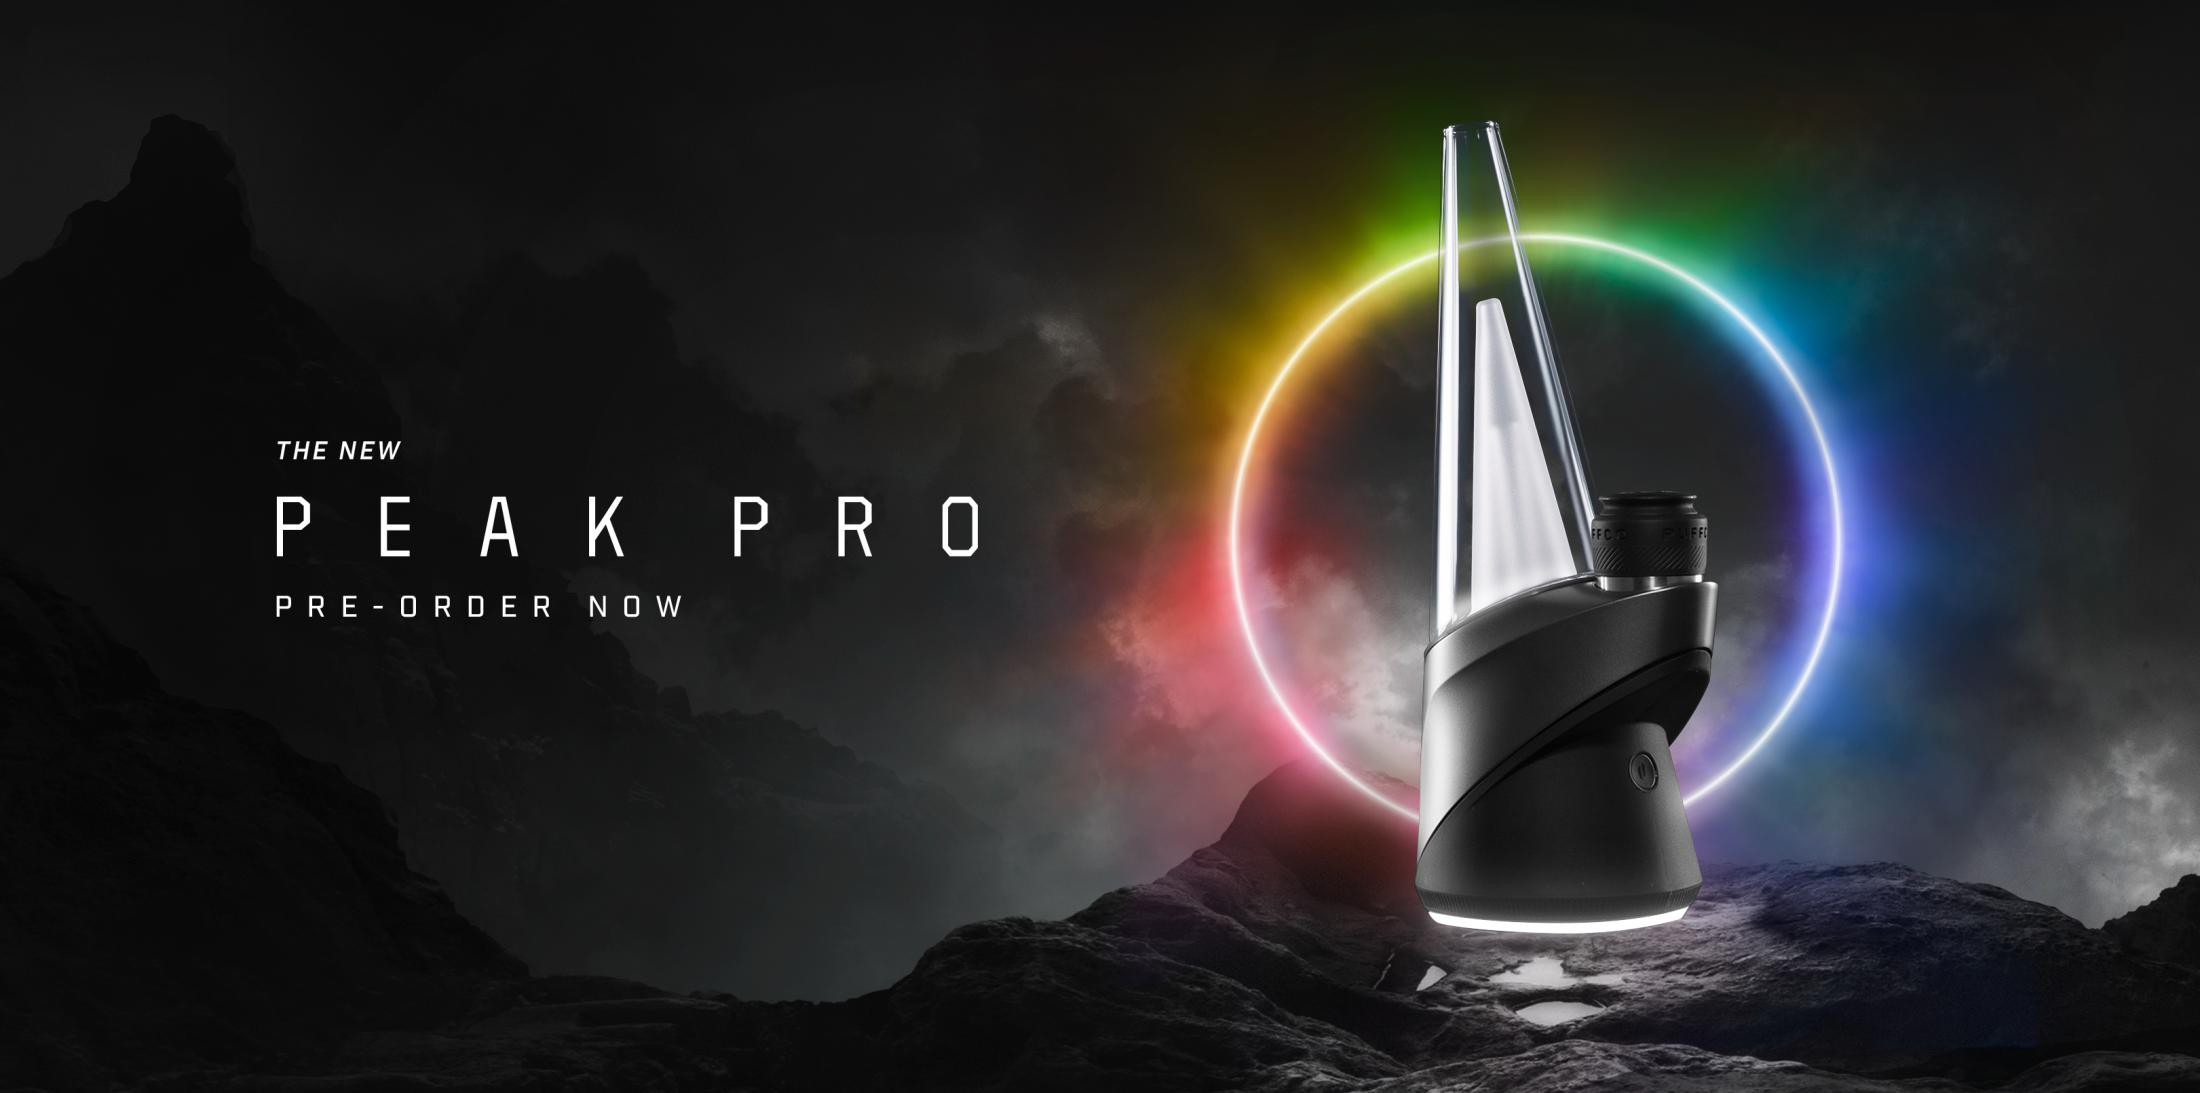 Puffco: The Puffco Peak Pro